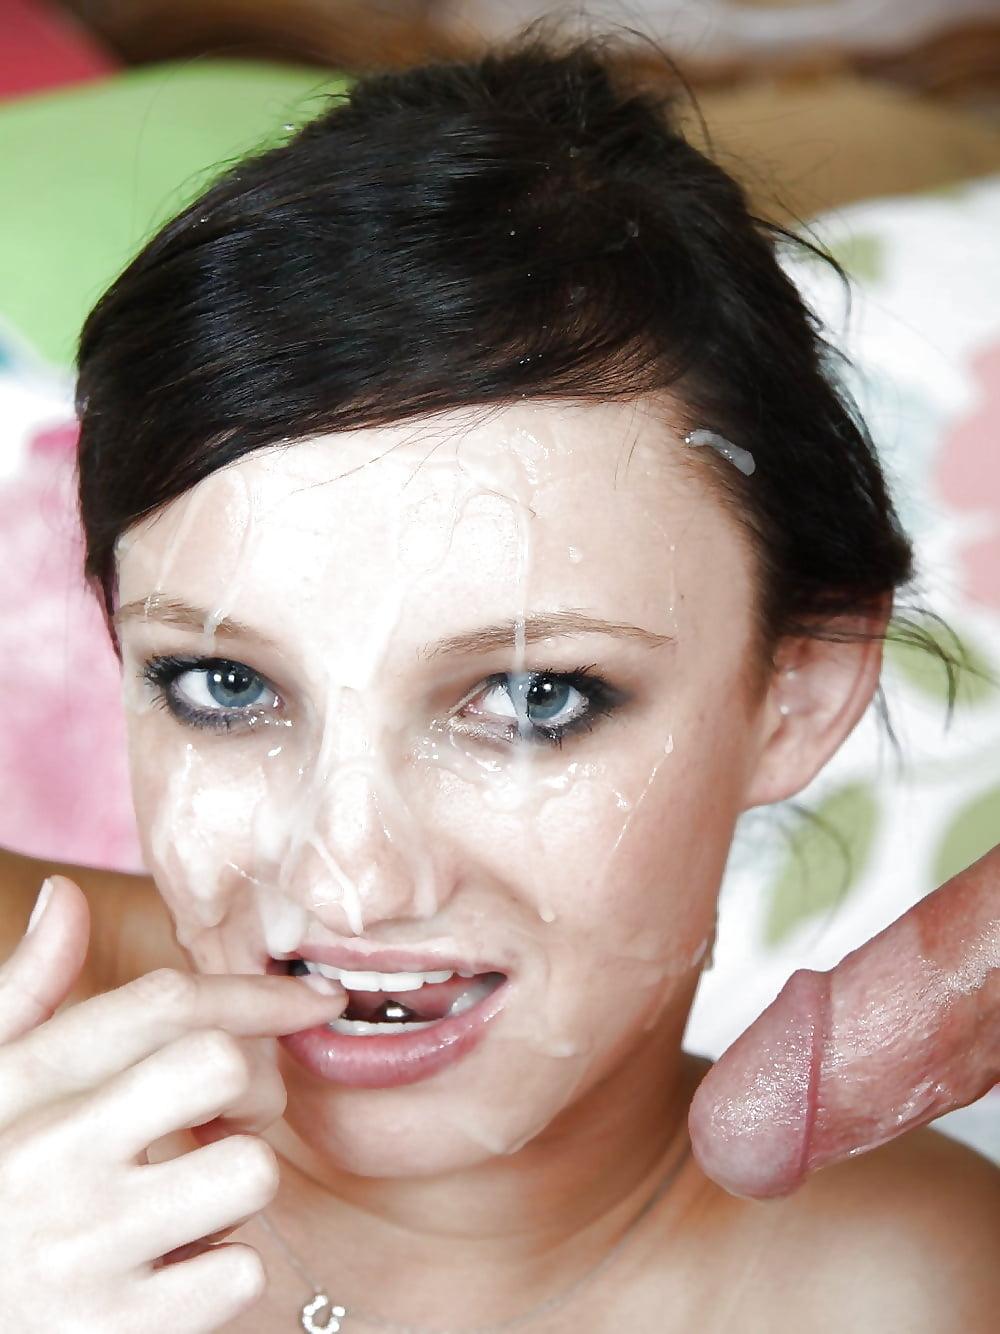 misty-anderson-cumshot-lasbianse-porn-movise